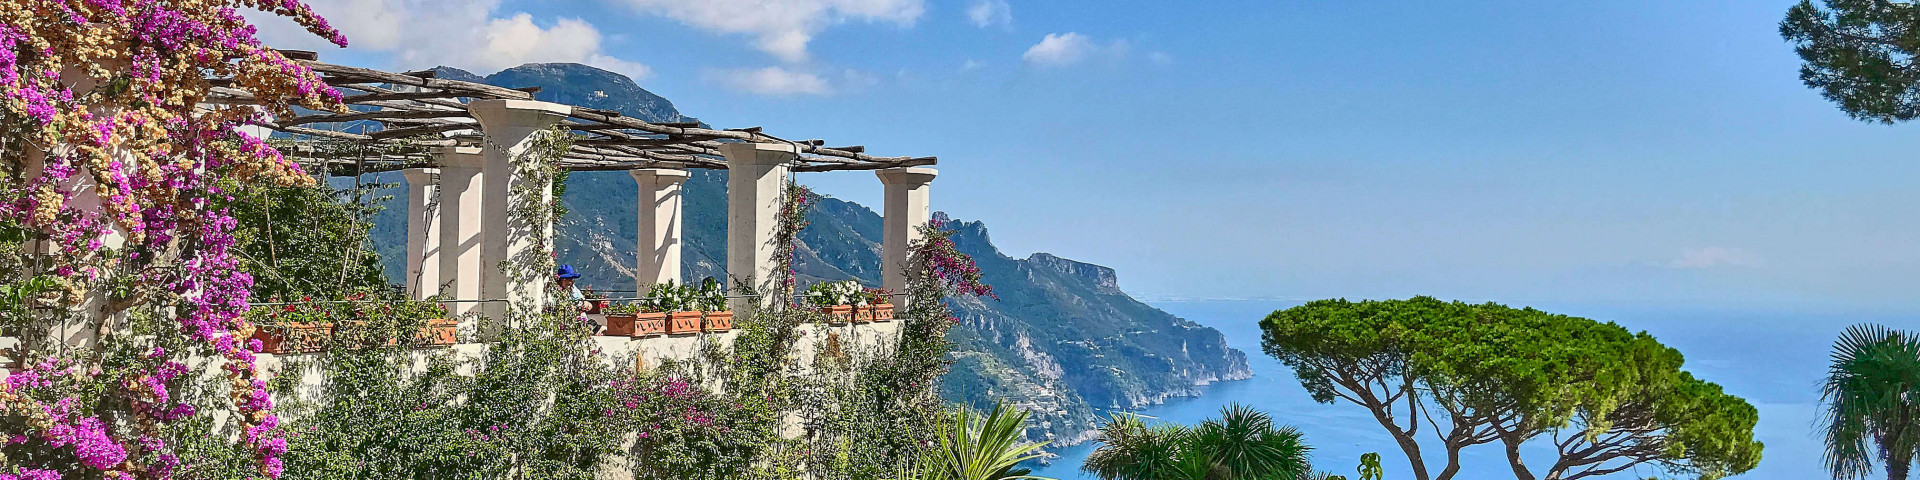 Terrace of Villa Rufolo